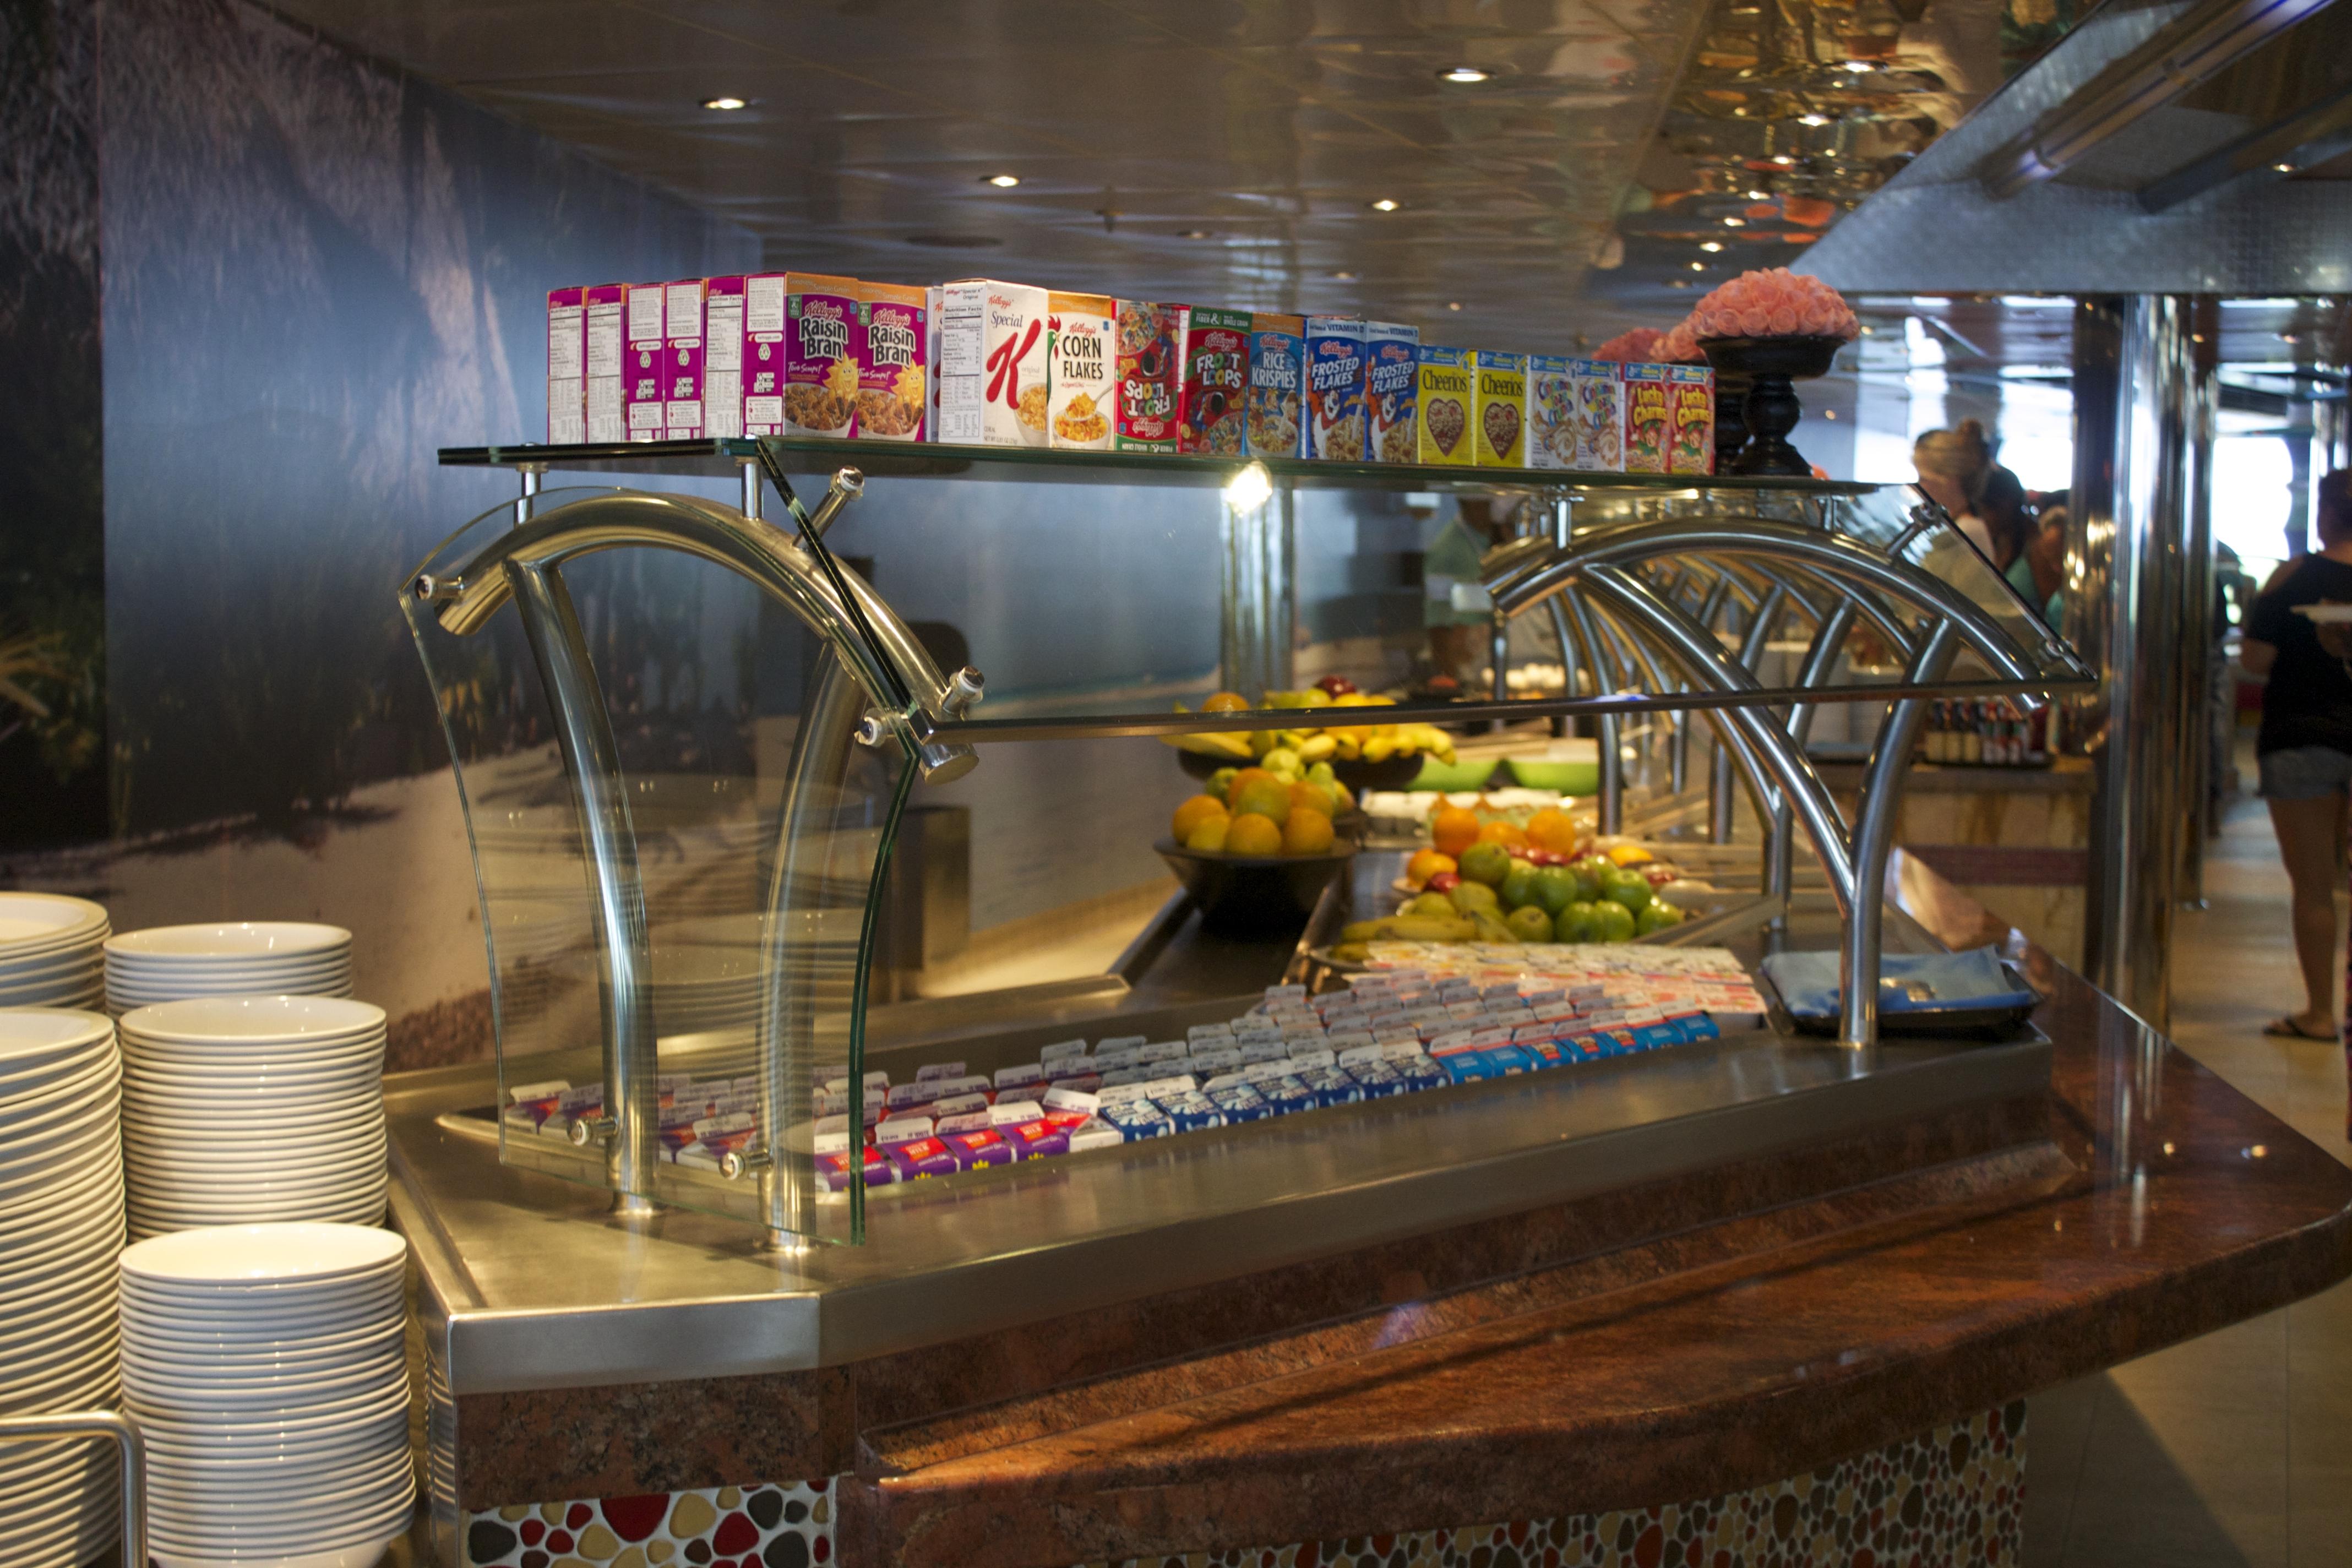 Carnival Cruise Food Aboard The Carnival Magic Cruise Ship